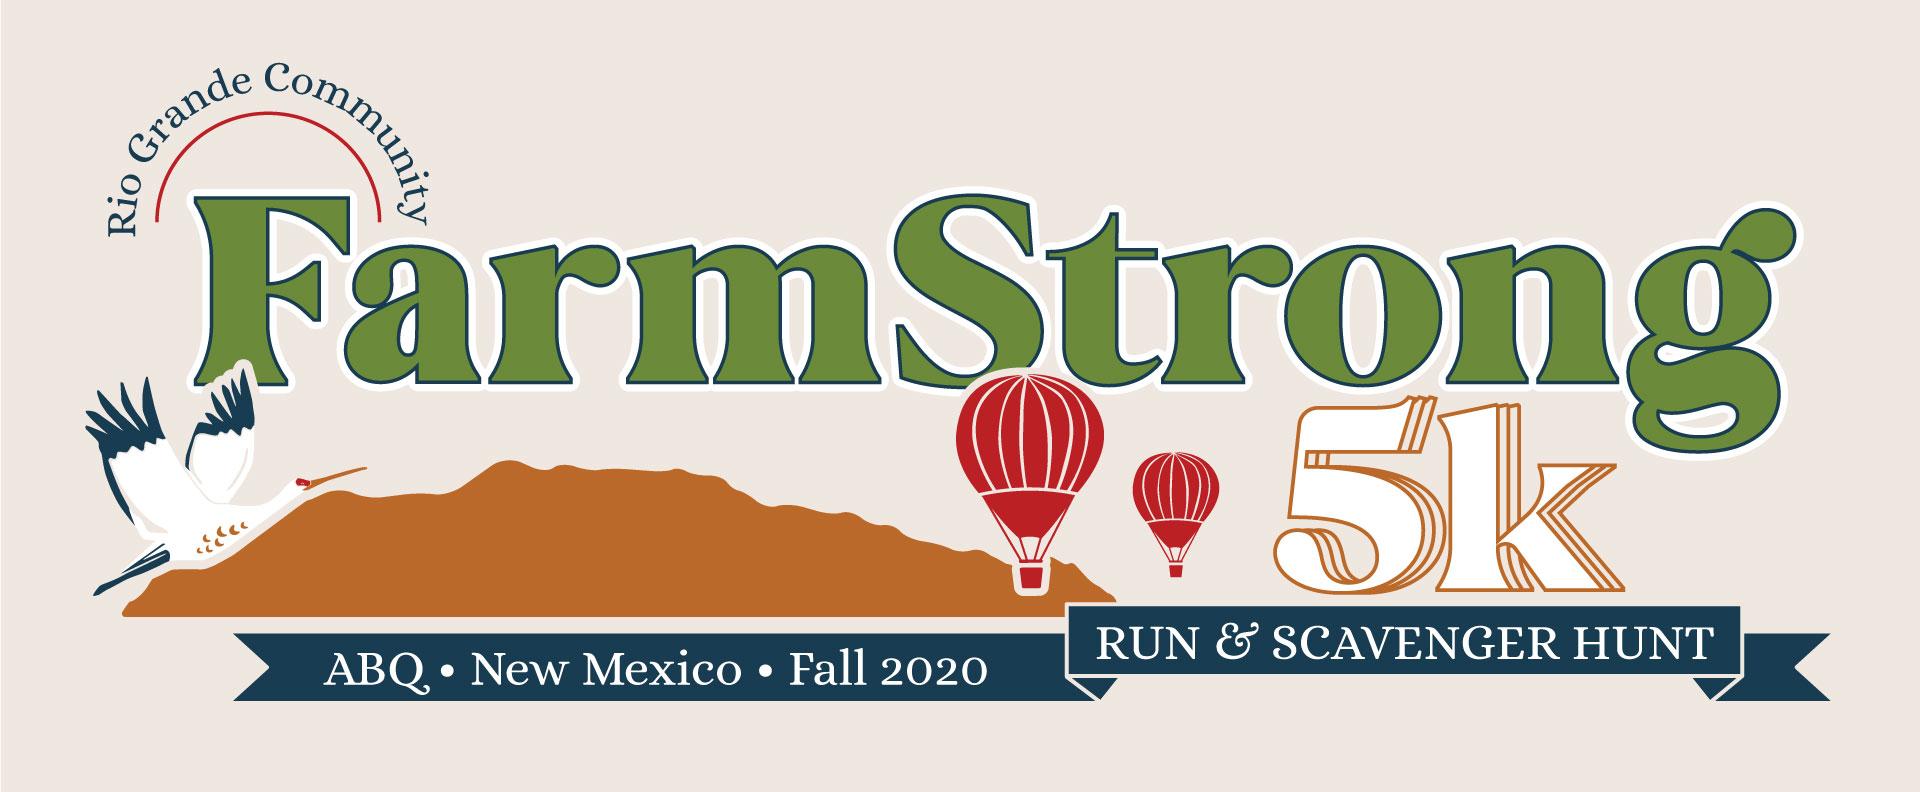 FarmStrong 5K Run & Scavenger Hunt